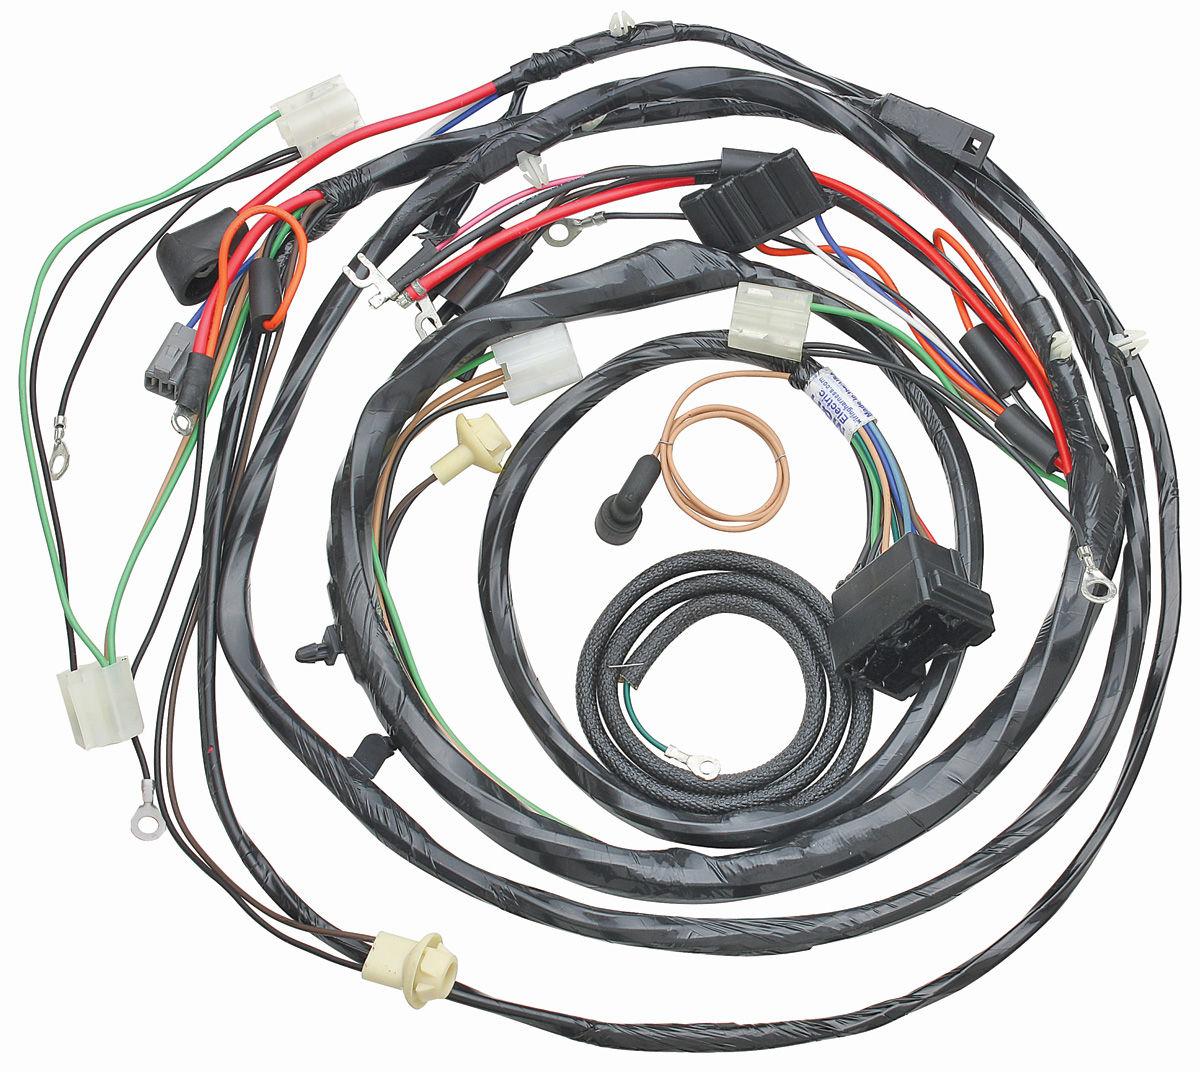 Wiring Harness, Forward Lamp, 1969 Chev/El Cam, V8/Gauges @ OPGI.comOriginal Parts Group